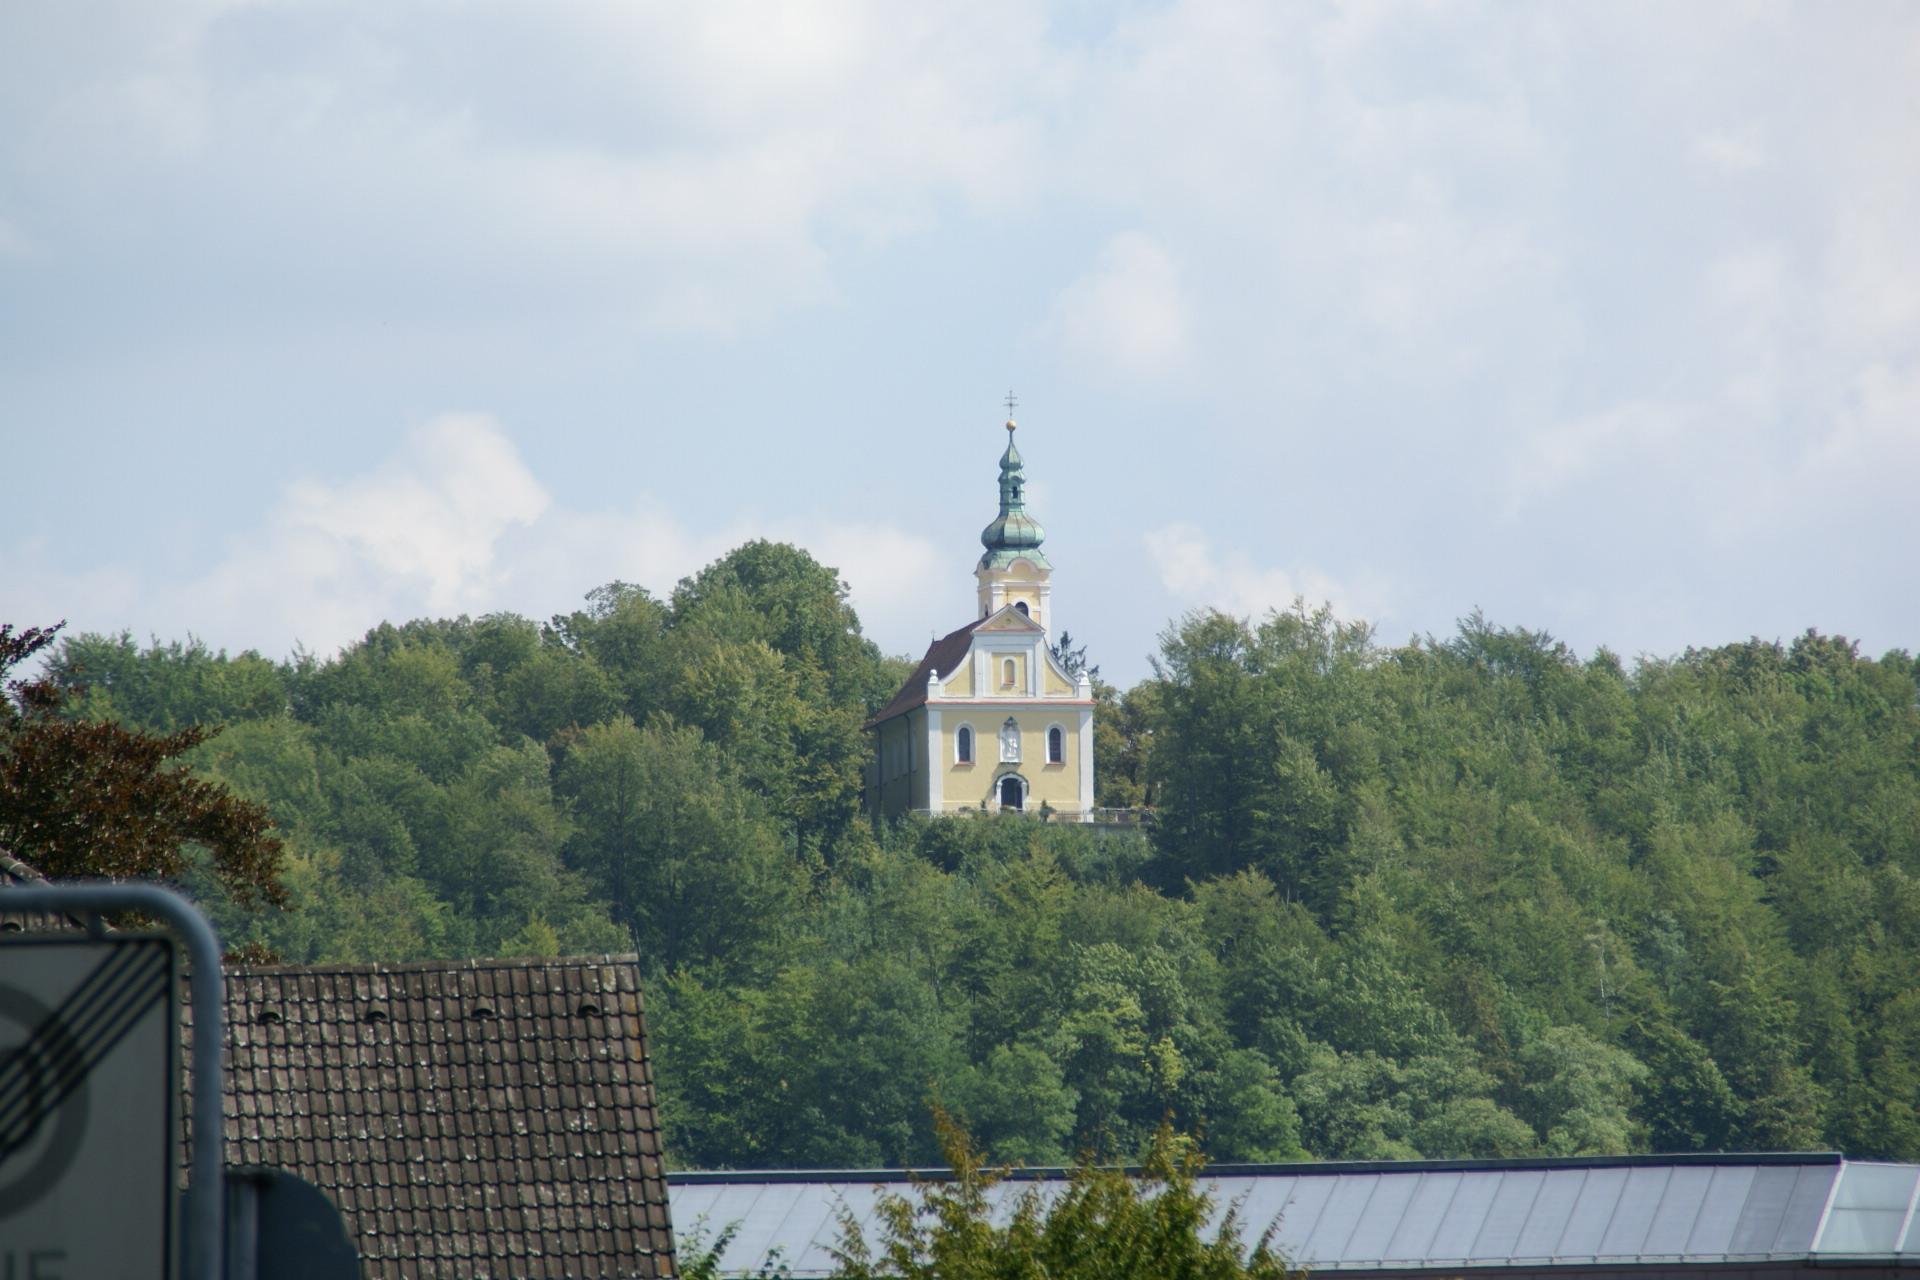 Datei:2010.08.22.132838 Annaberg Sulzbach-Rosenberg.jpg